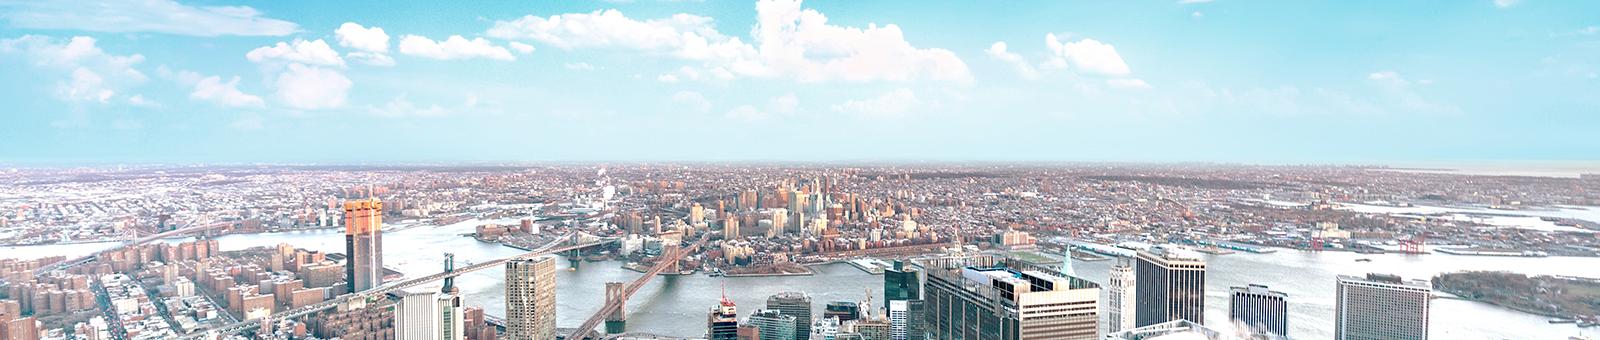 Urban, City, Town